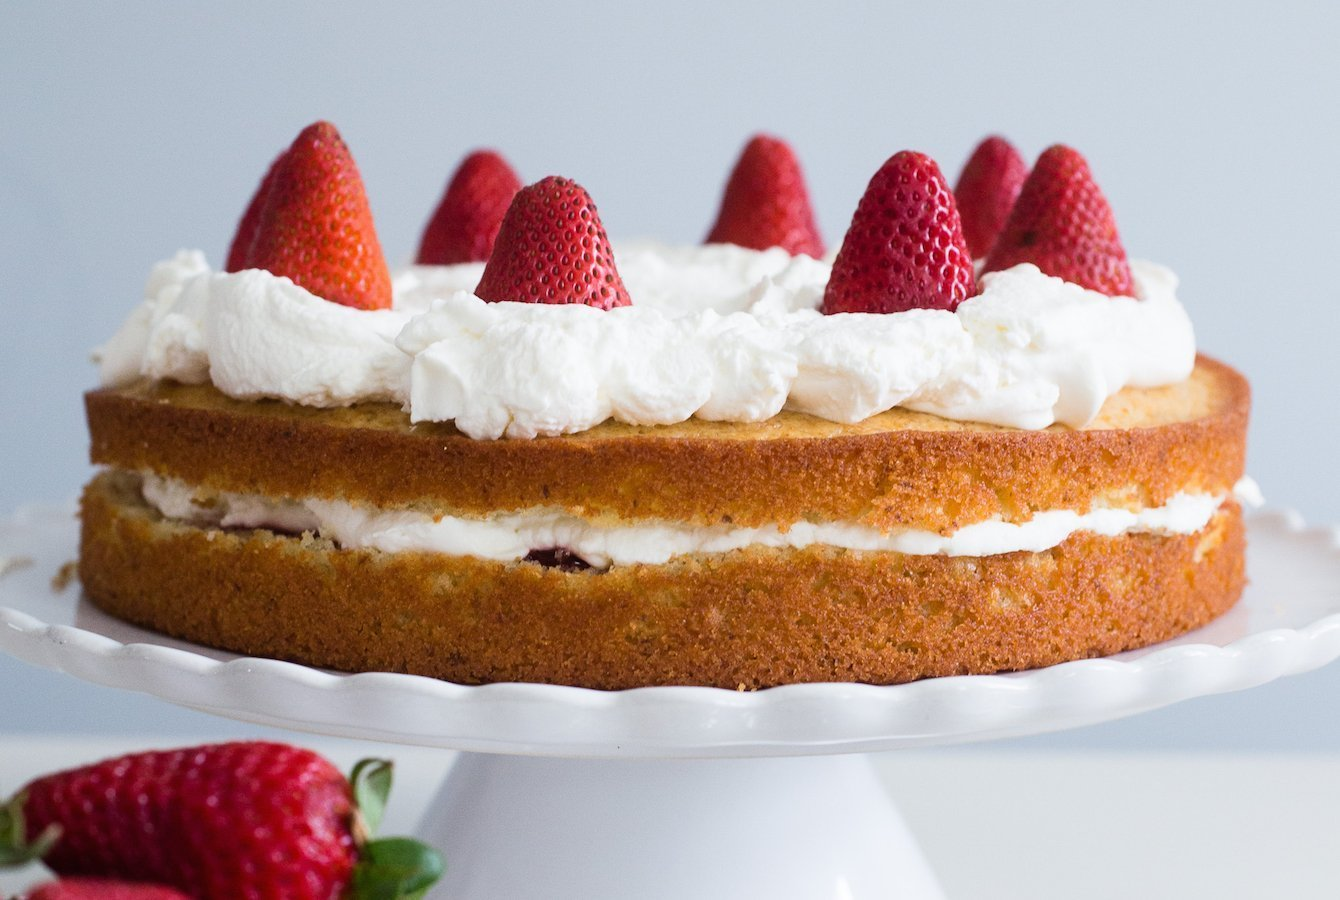 French Lemon Strawberry Jam Yogurt Cake